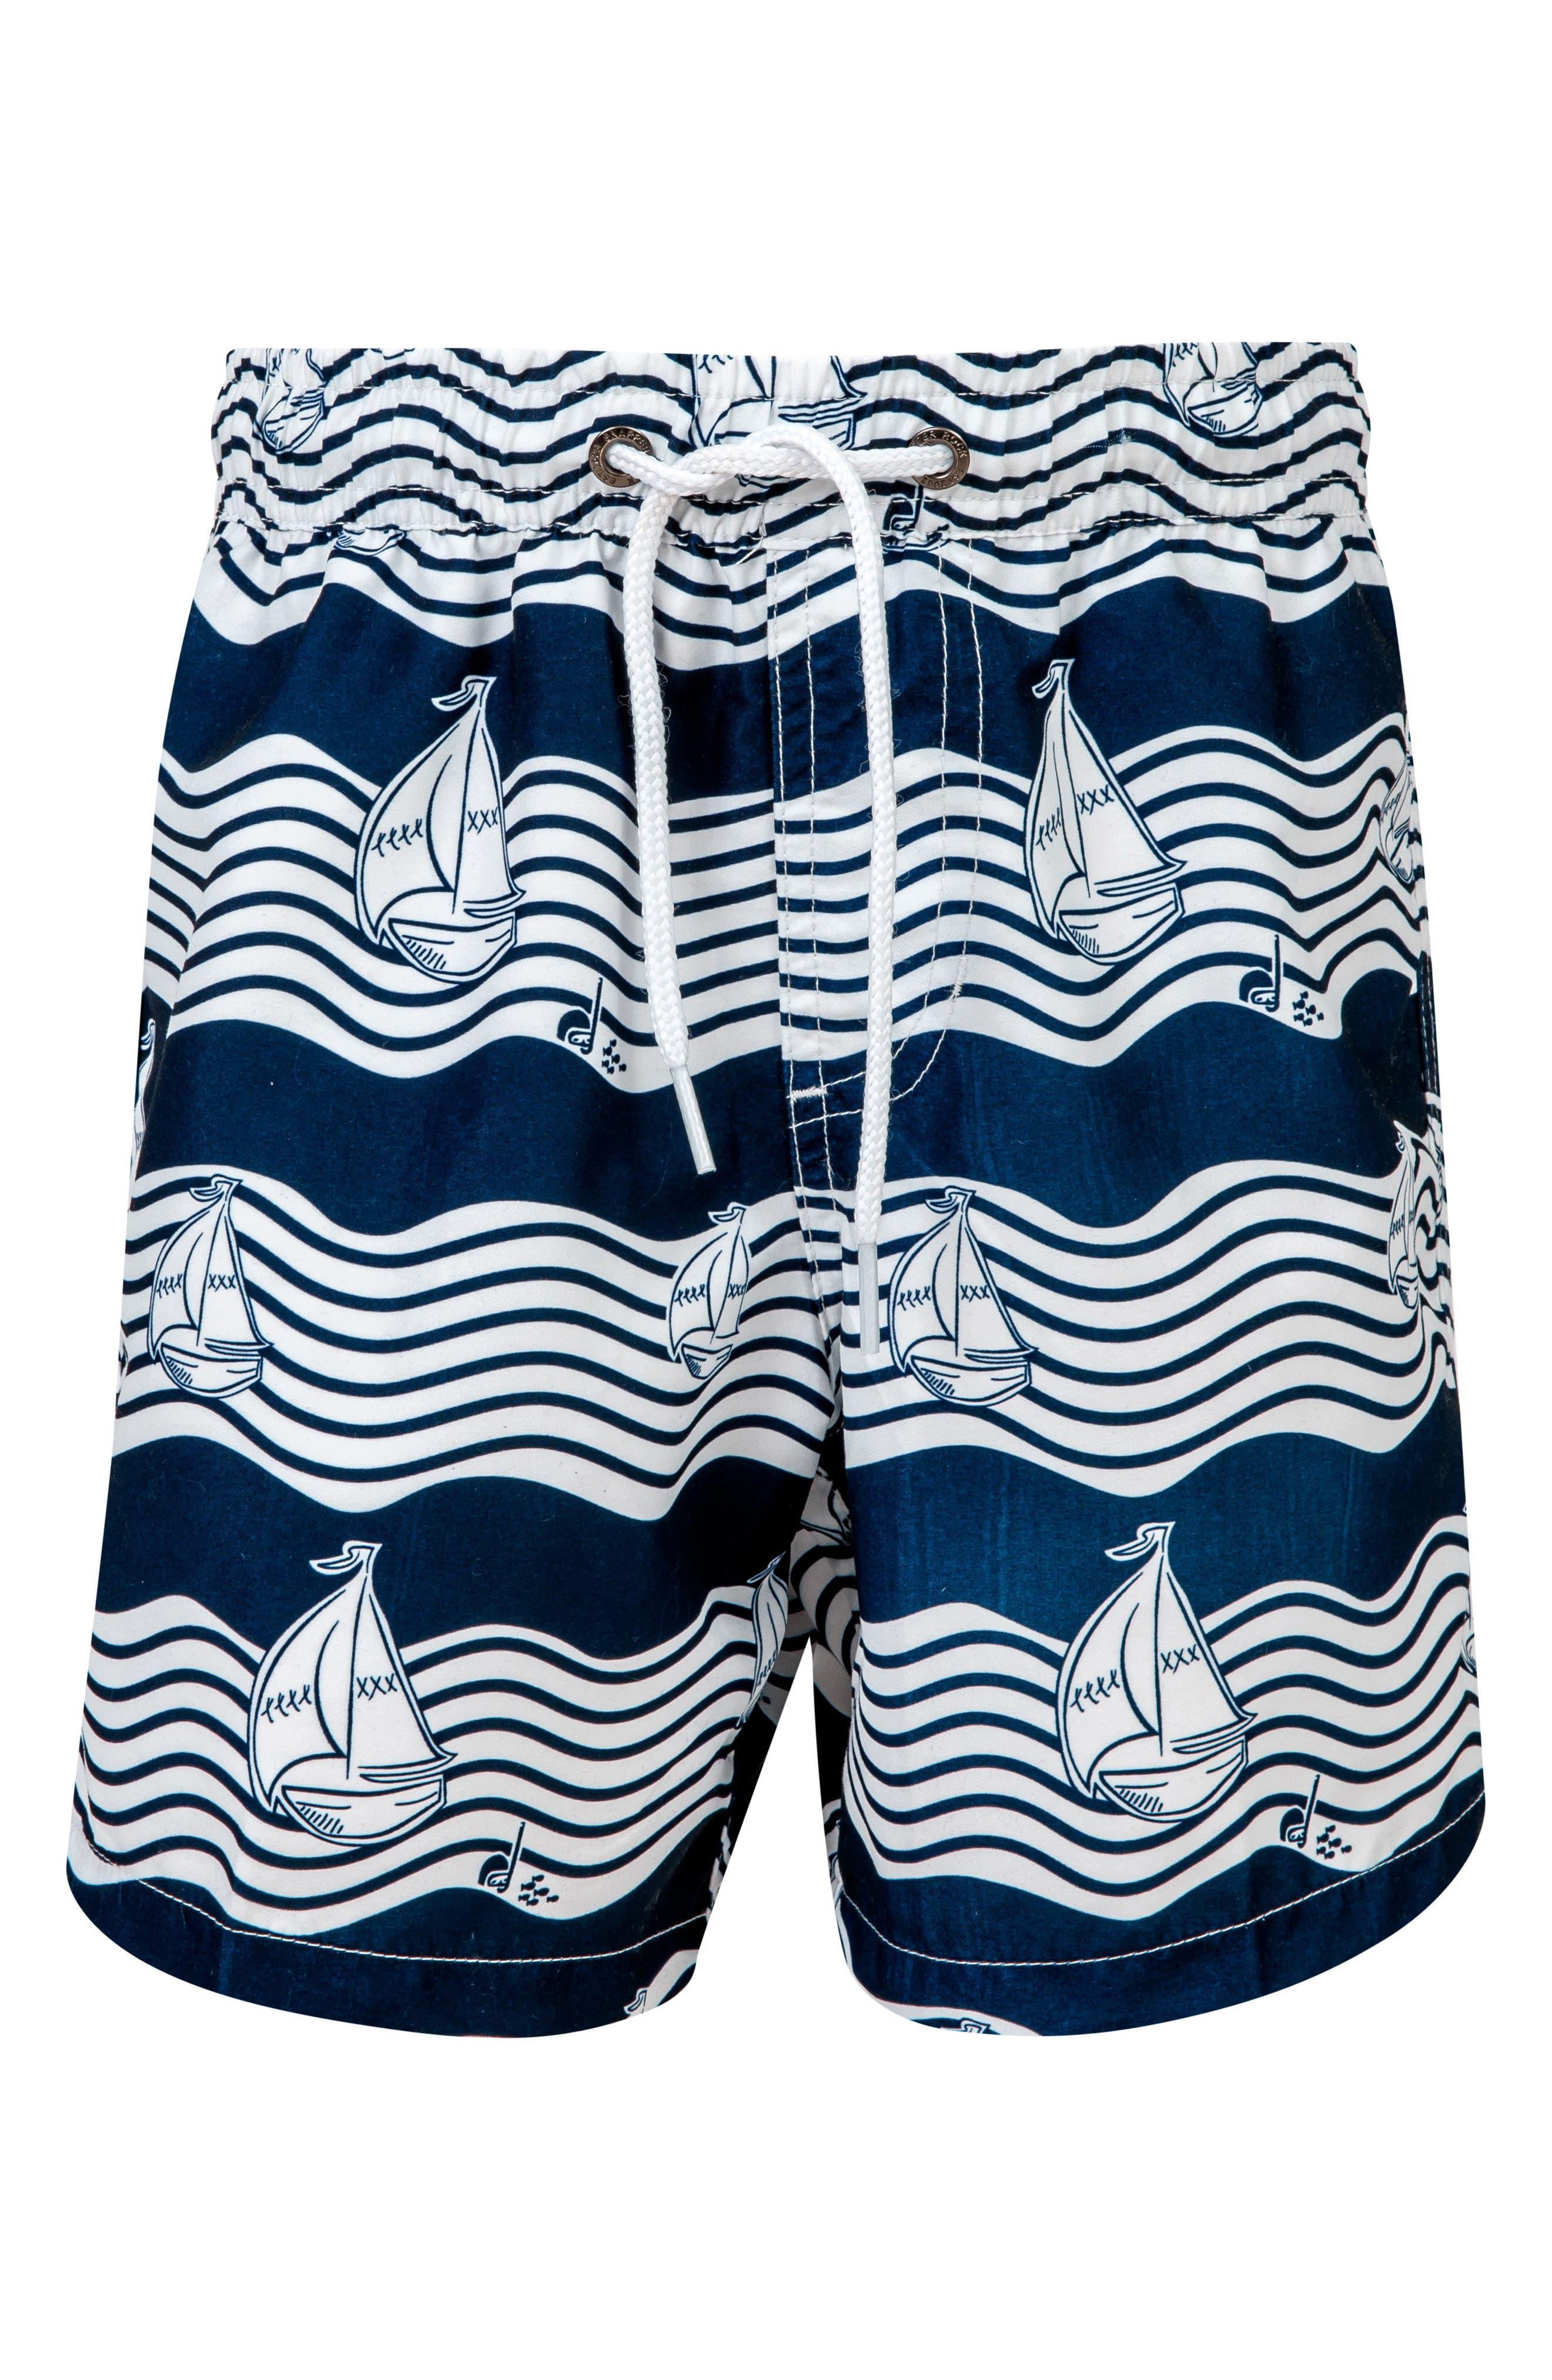 Ocean Explorer Board Shorts,                             Main thumbnail 1, color,                             White/ Navy